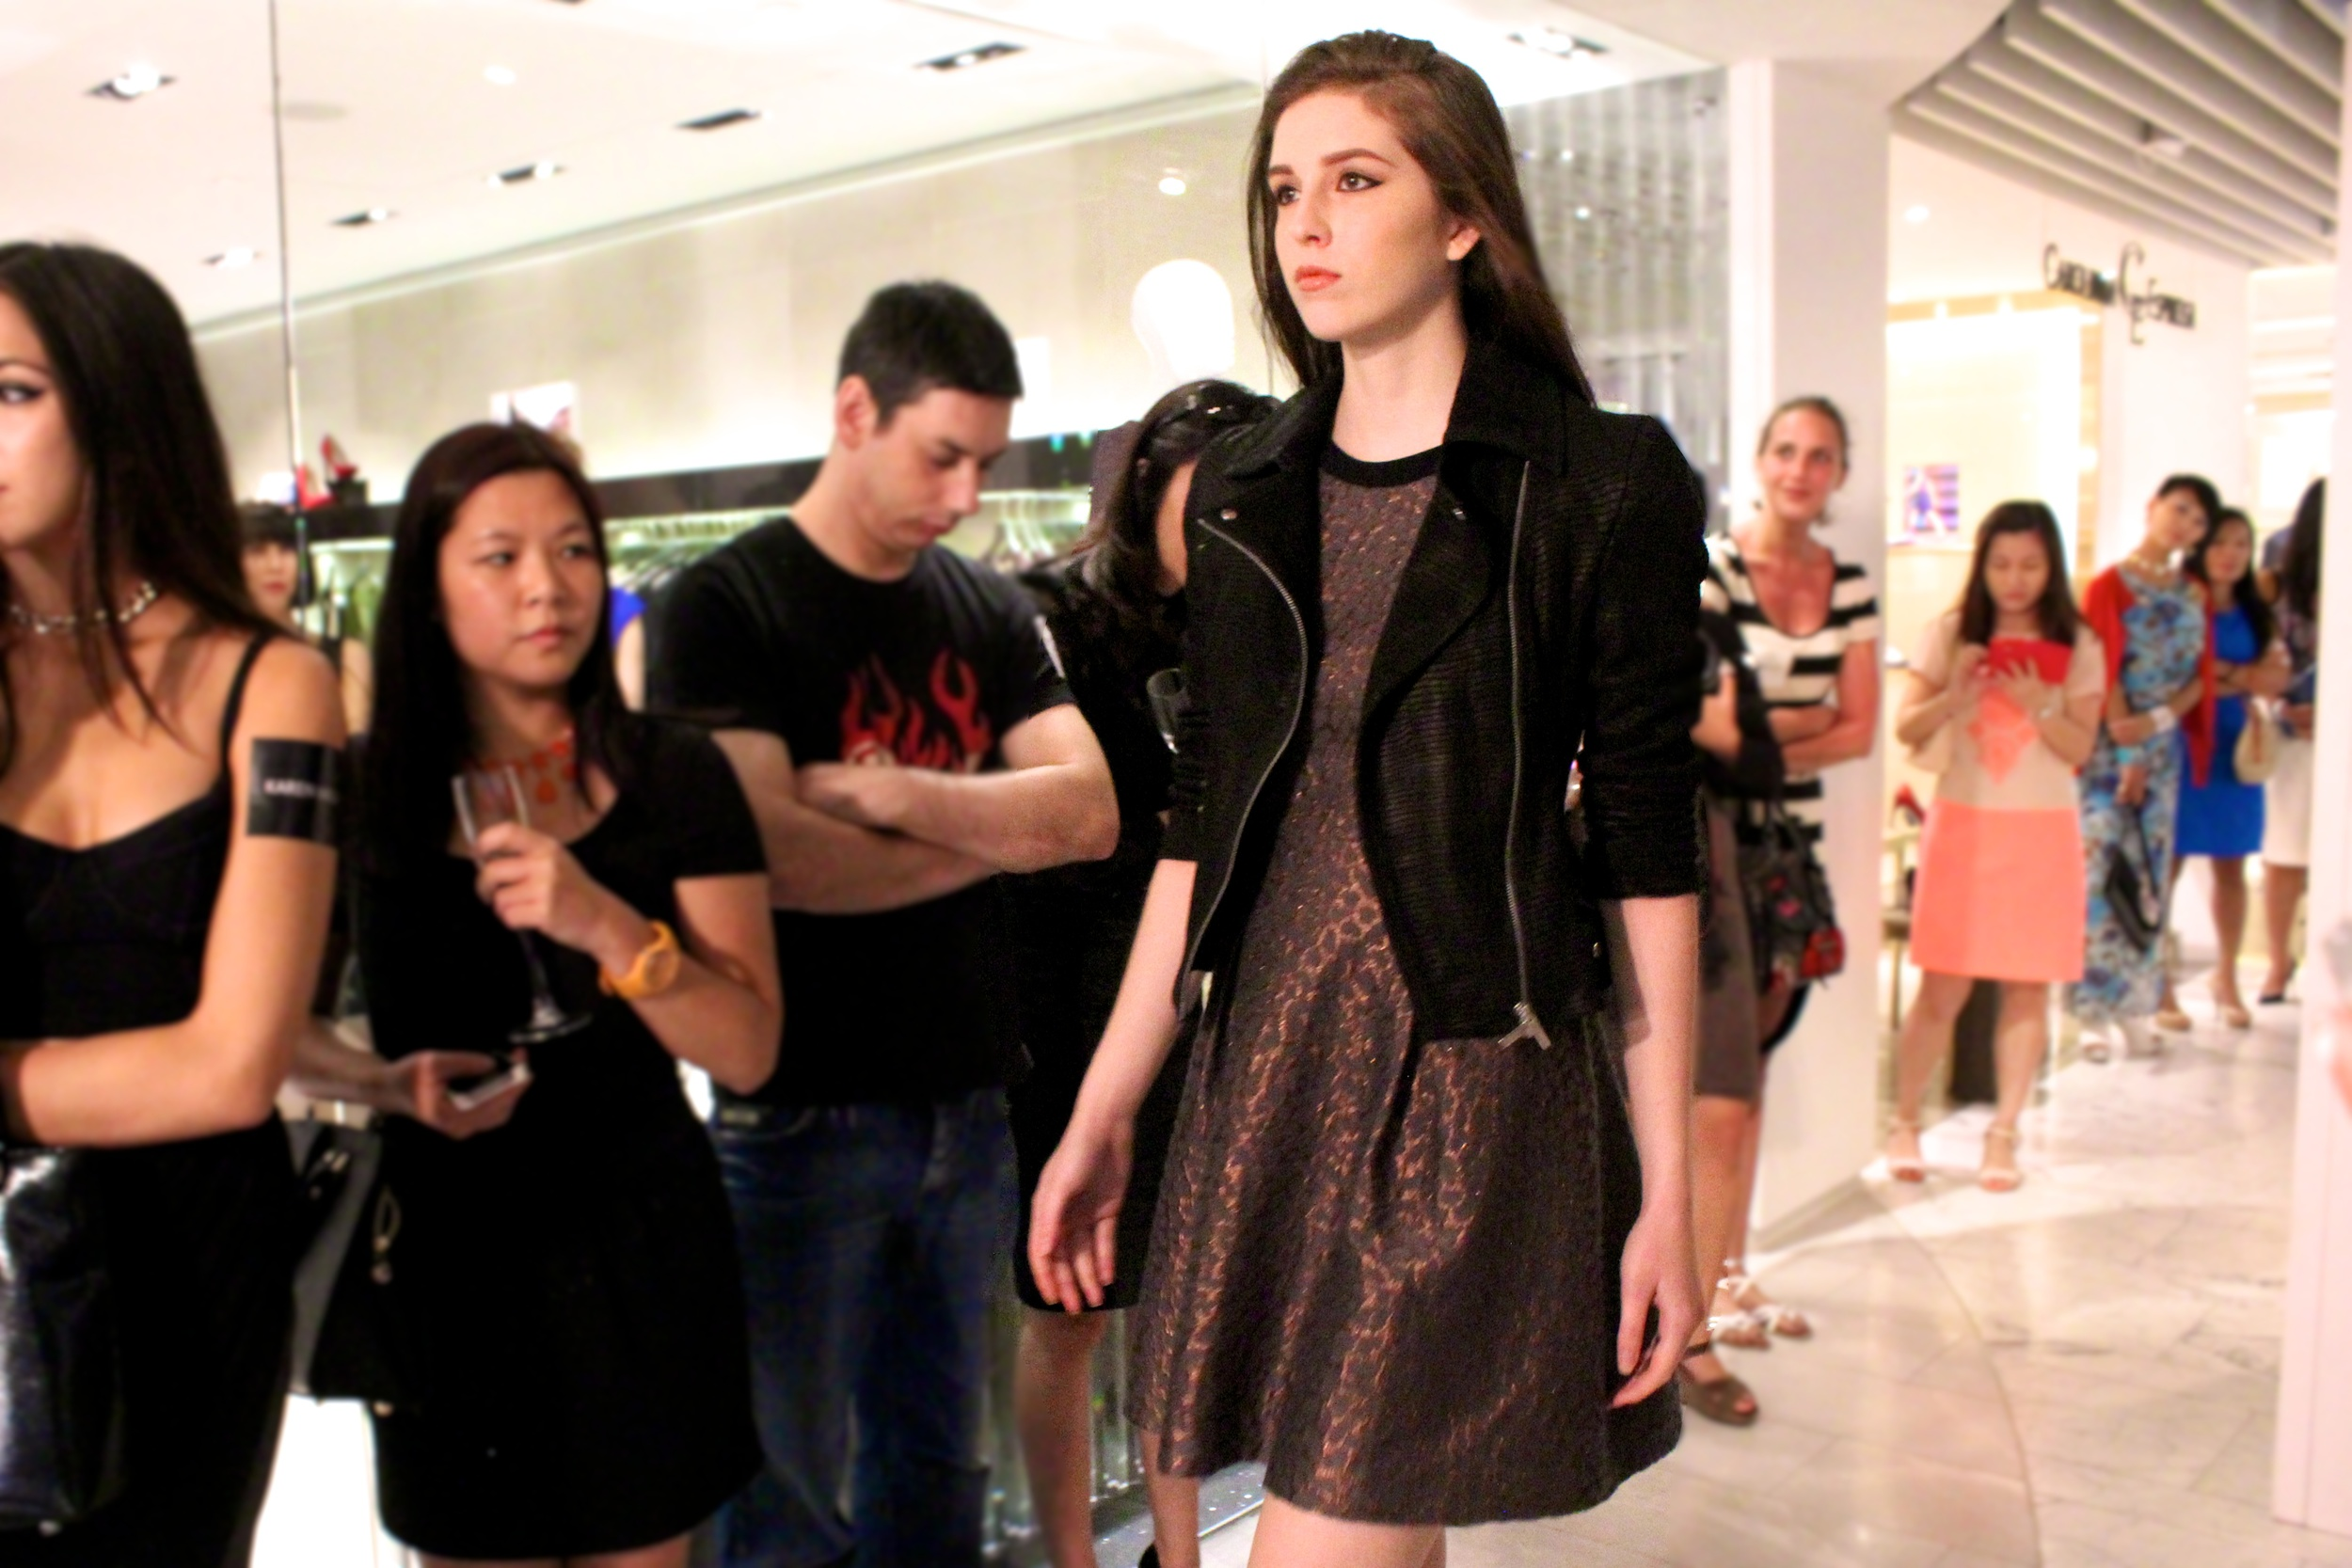 Dress:  Metallic jacquard dress